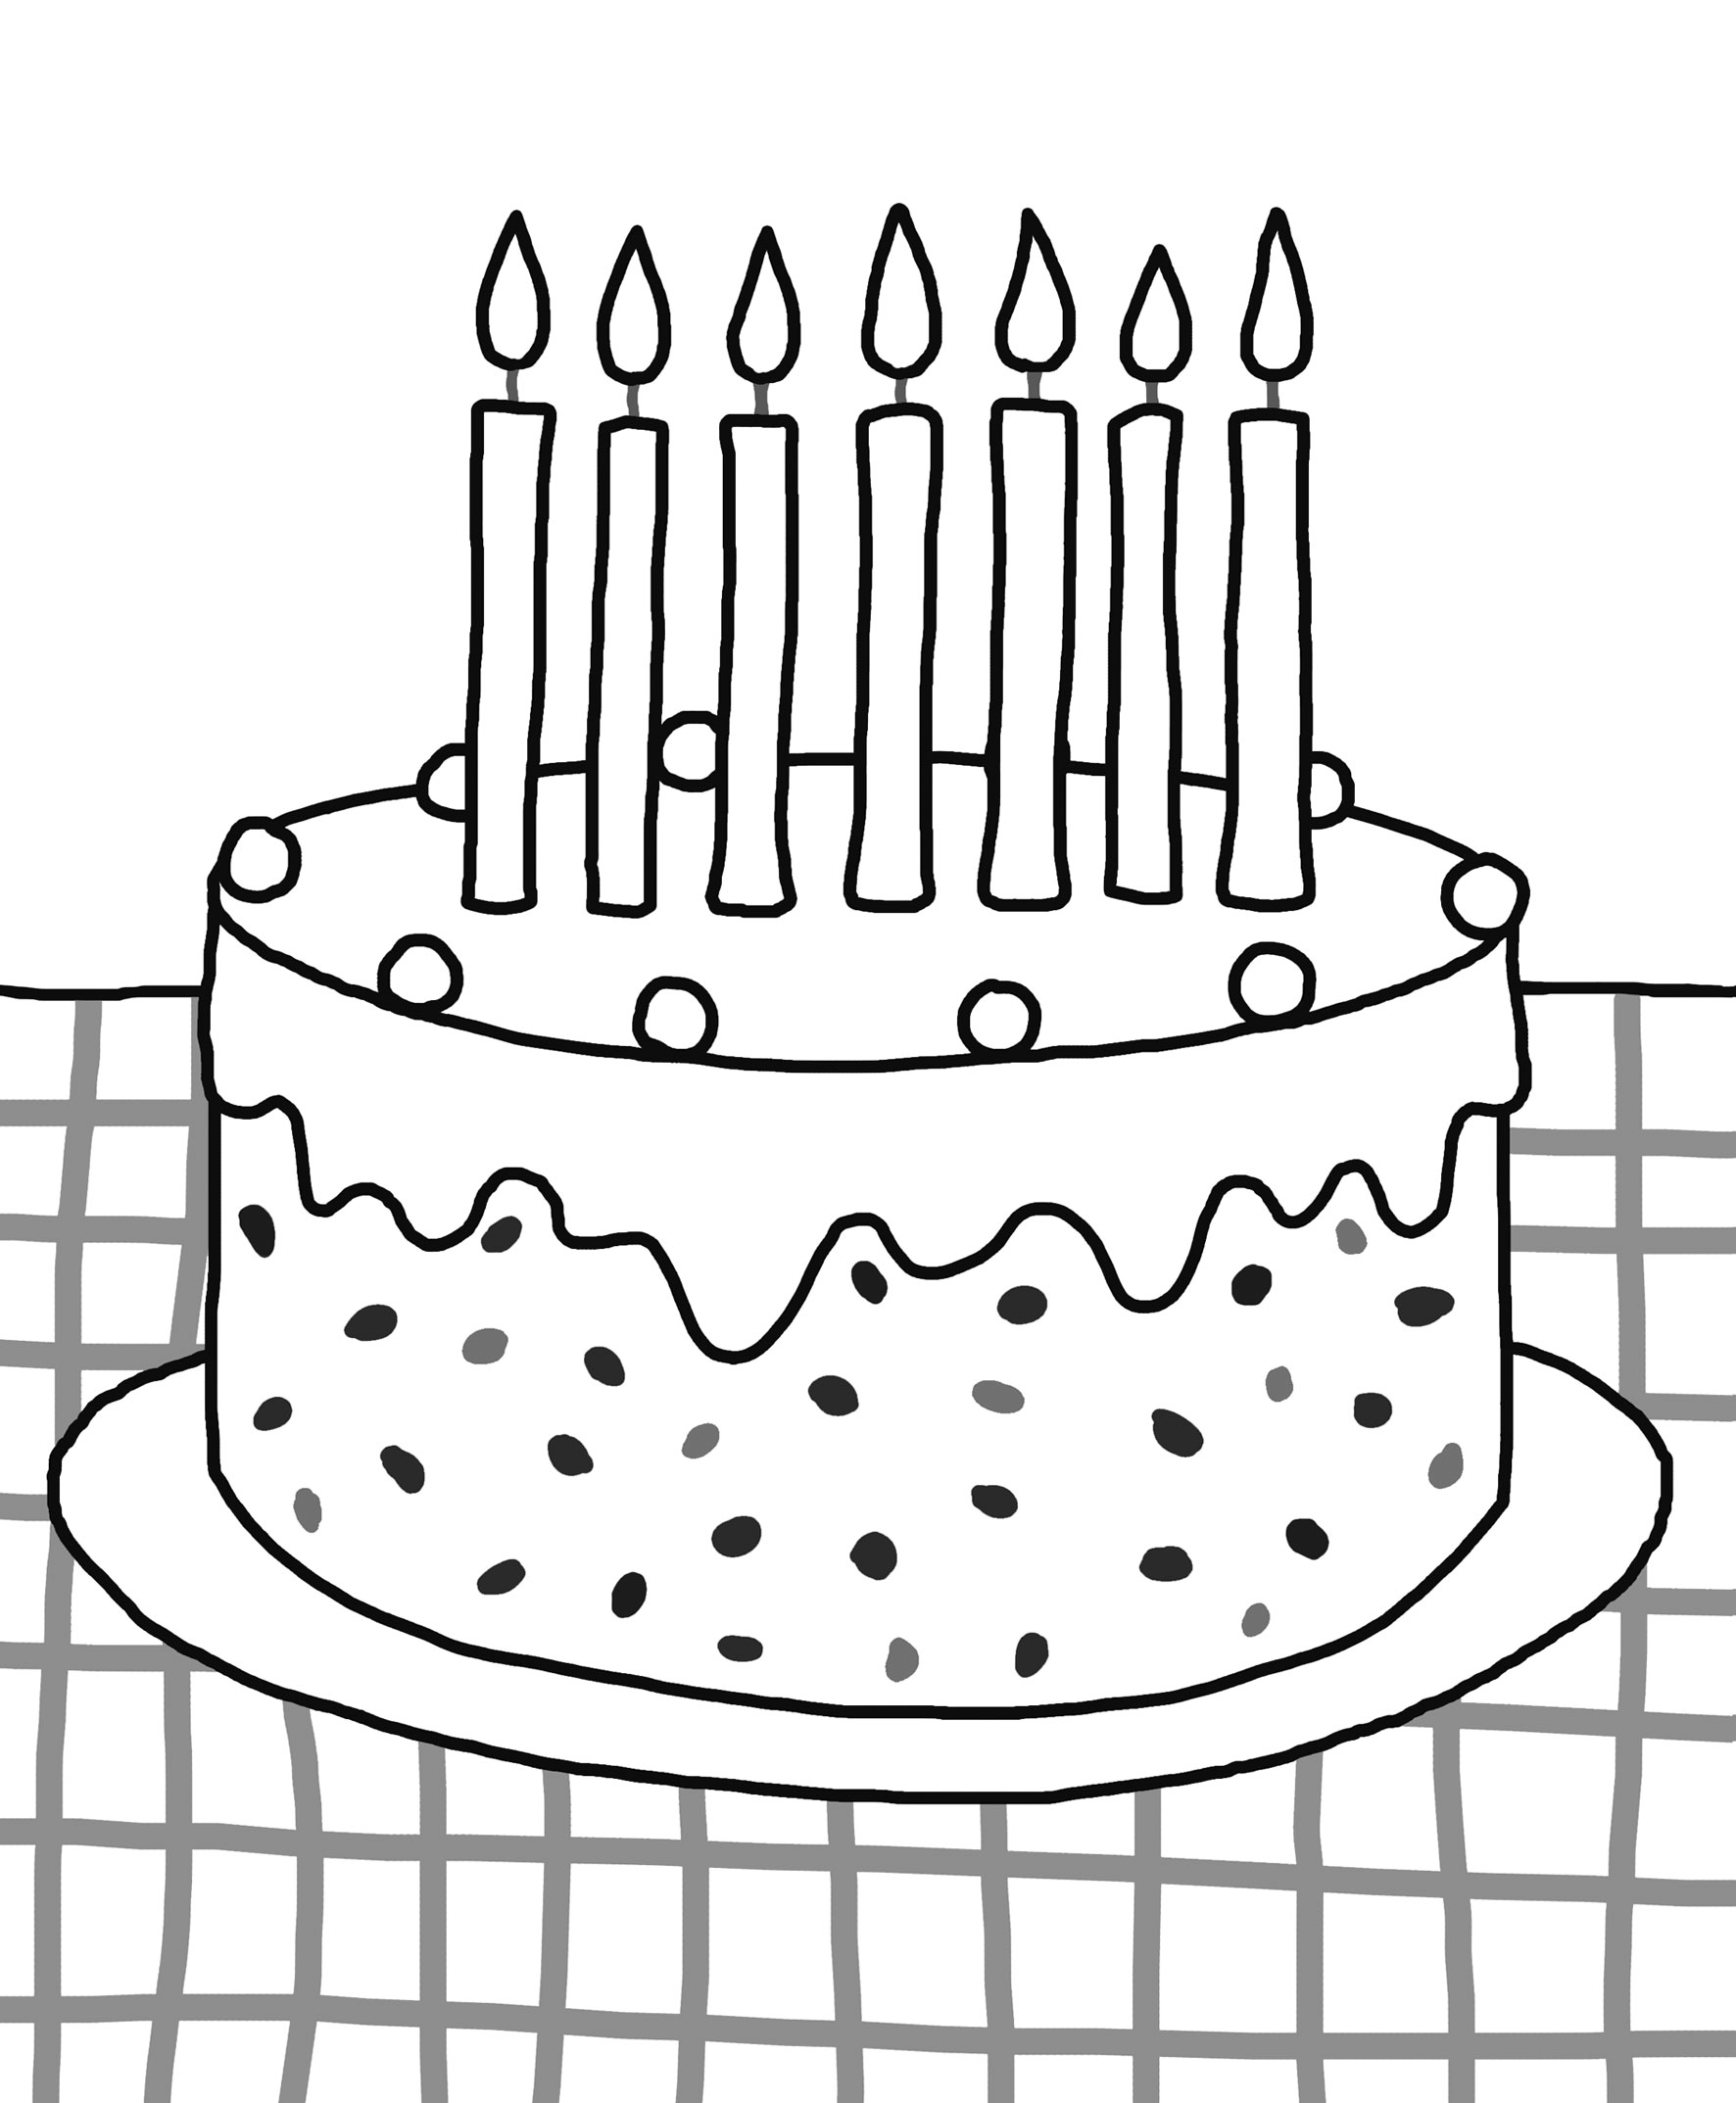 Cake Drawing Template At Getdrawings